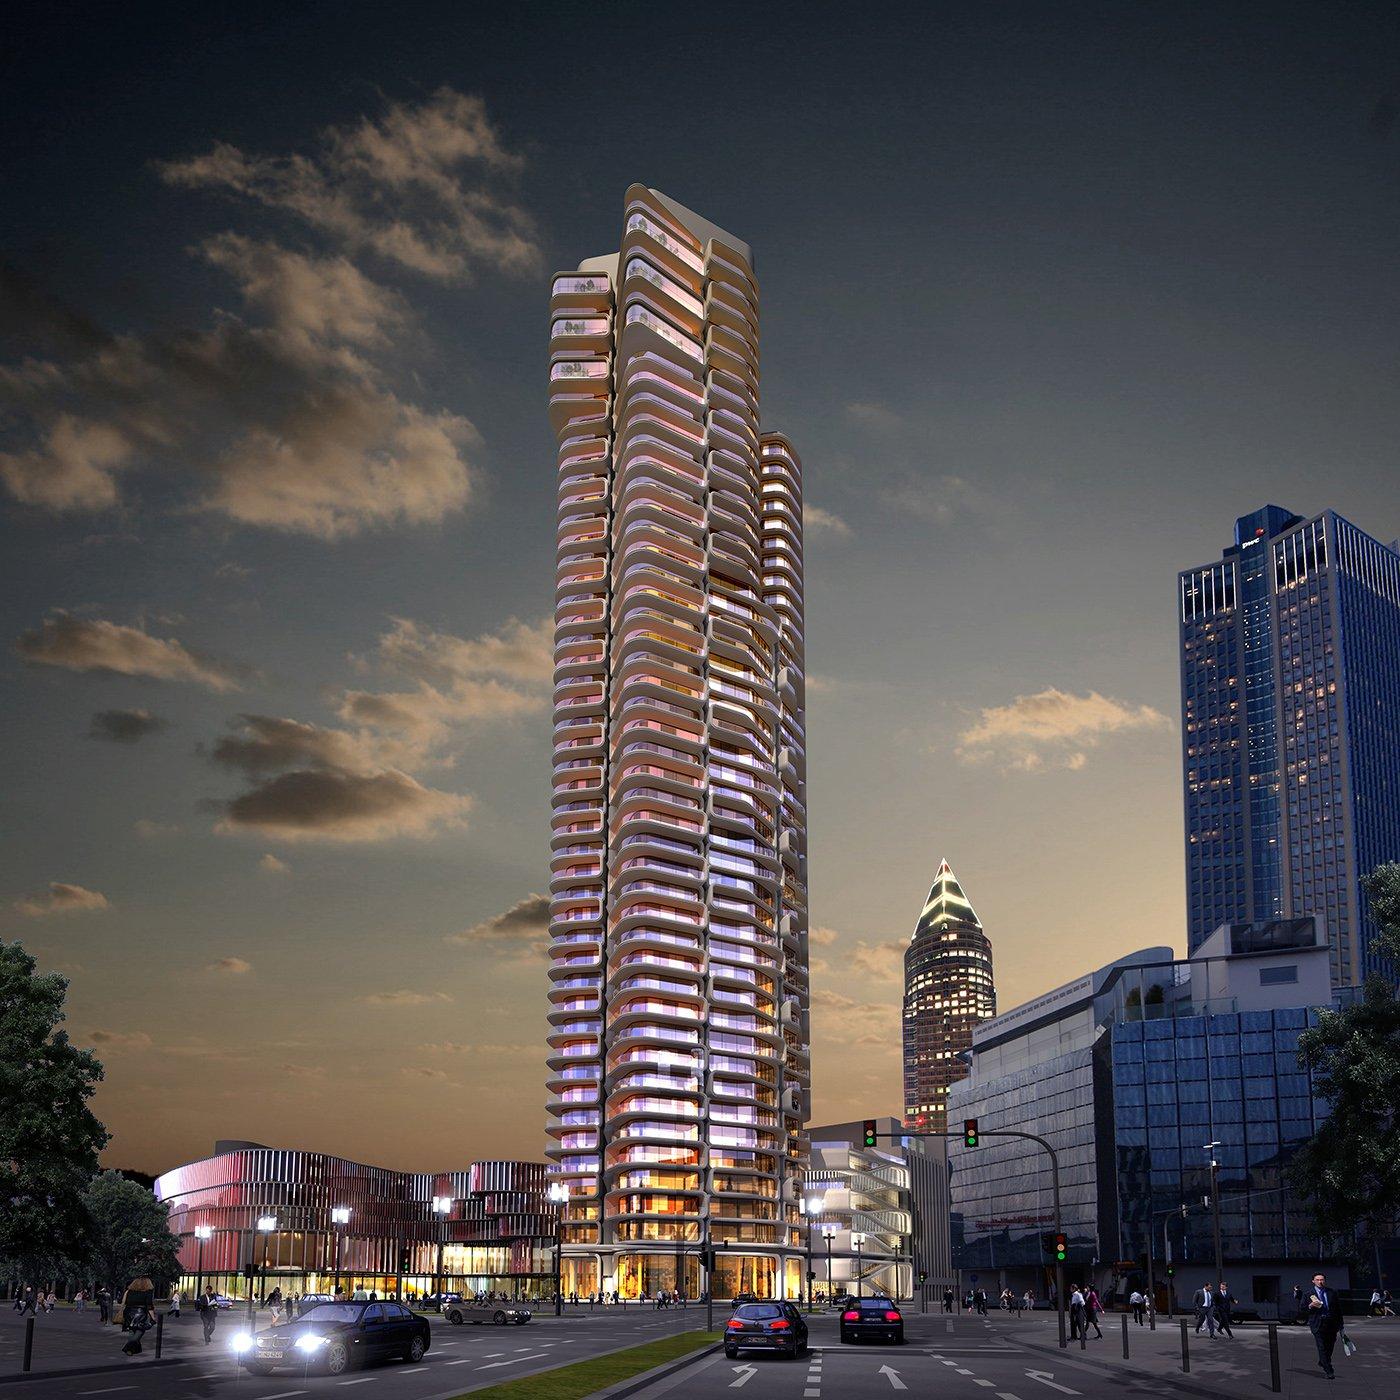 hochhauswelten frankfurt grand tower wohnturm 172m. Black Bedroom Furniture Sets. Home Design Ideas